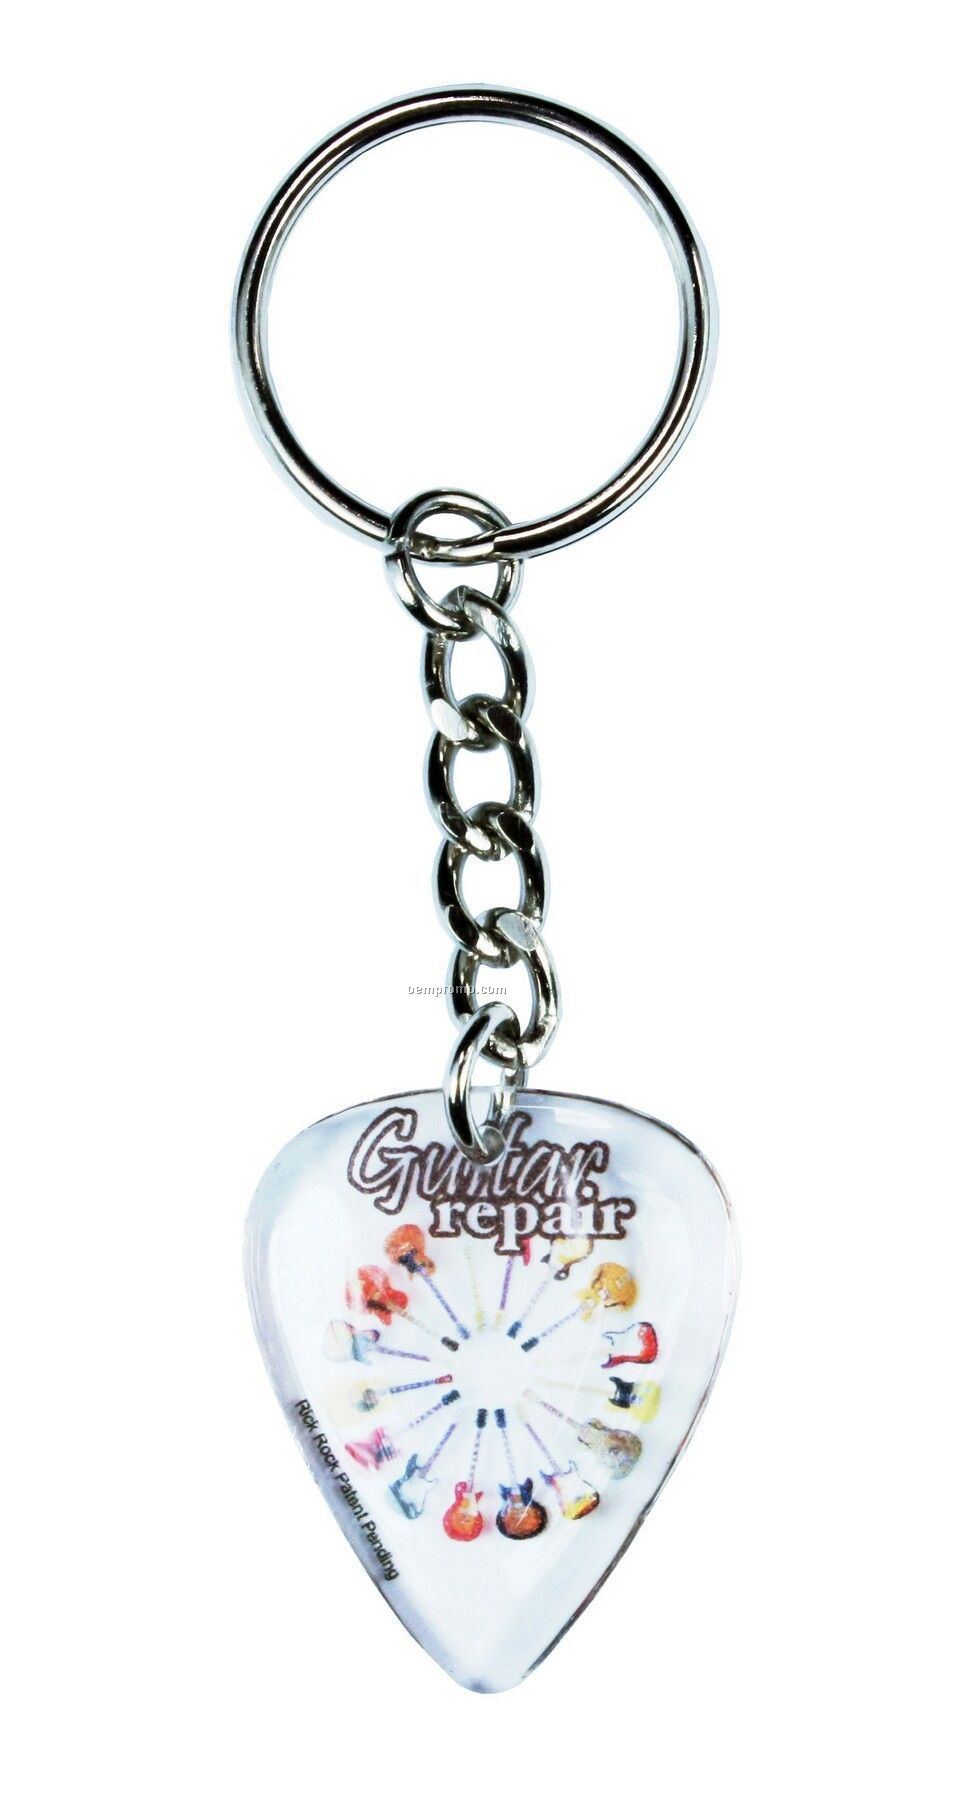 Custom Pick Key Chain Custom Pick Key Chain Custom Pick Key Chain